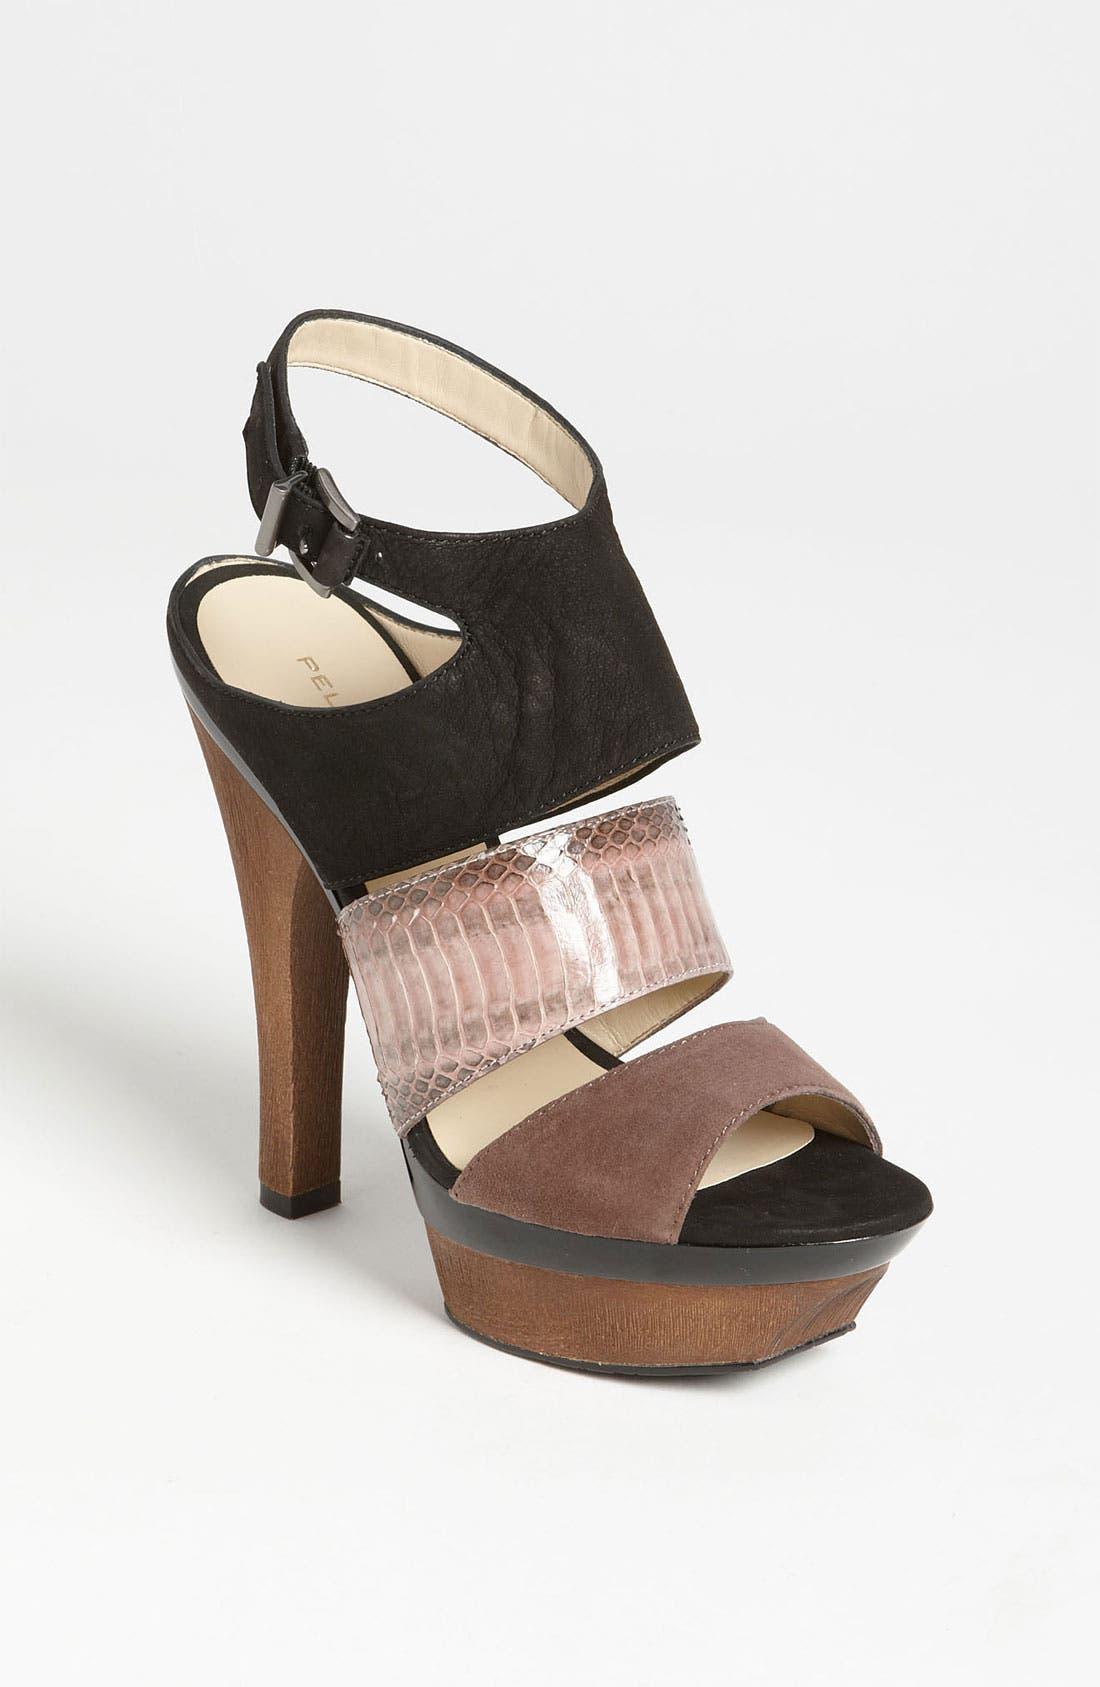 Main Image - Pelle Moda 'Mally' Sandal